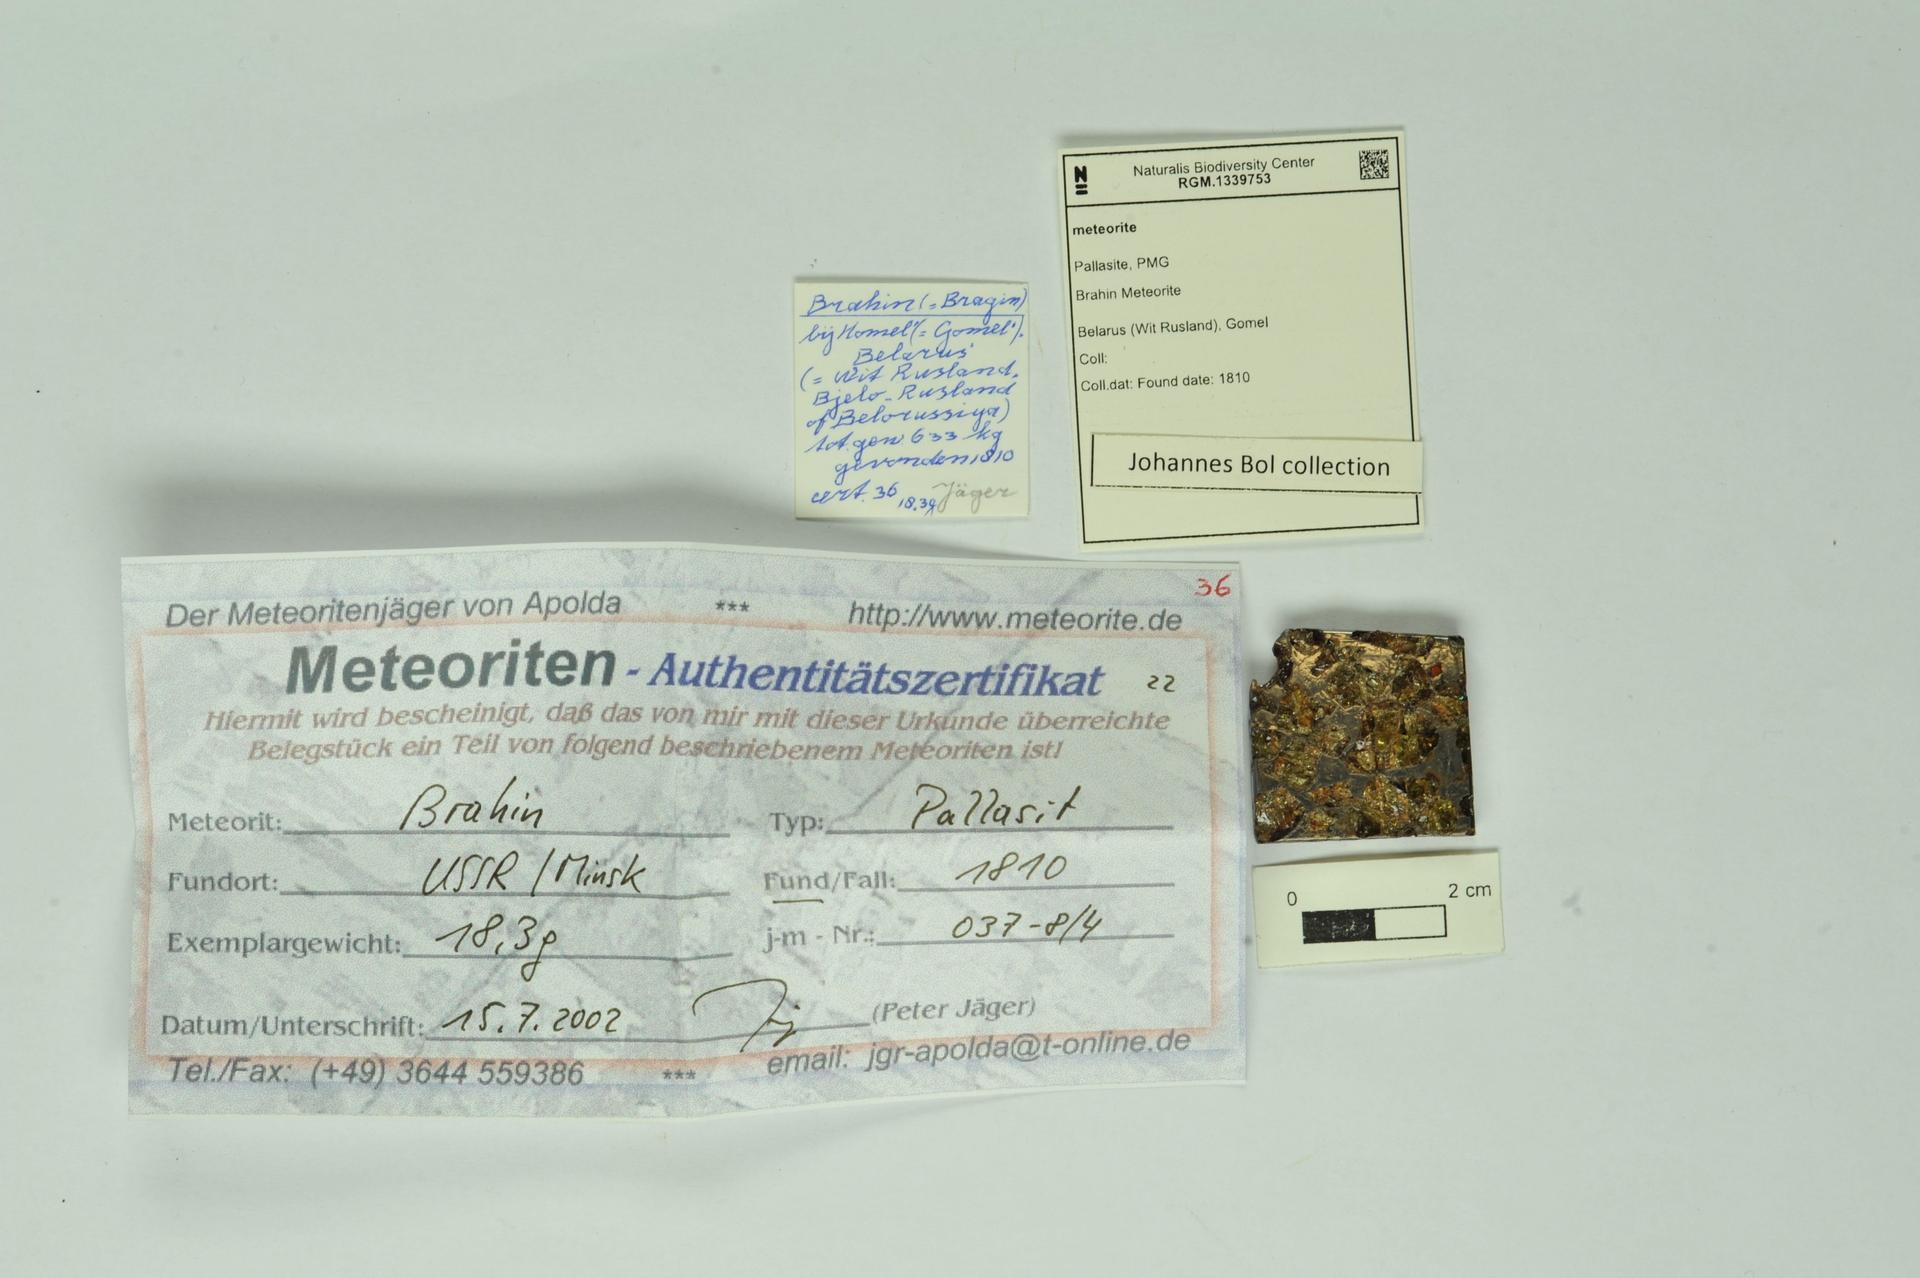 RGM.1339753 | Pallasite, PMG